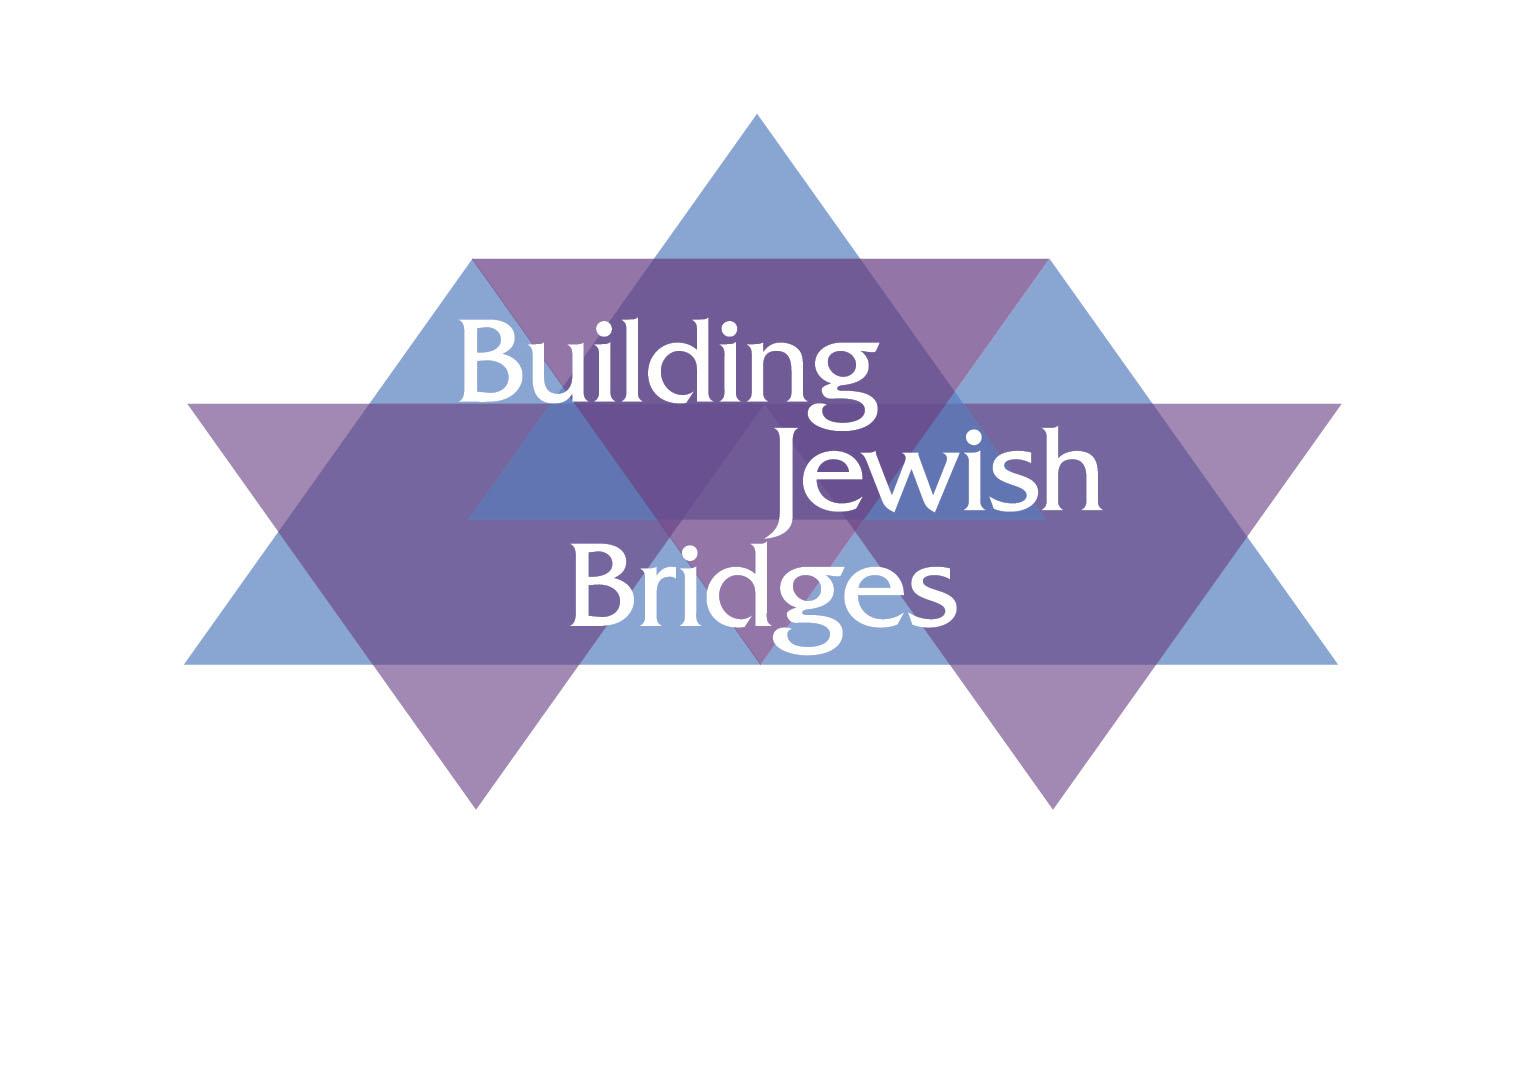 Building Jewish Bridges